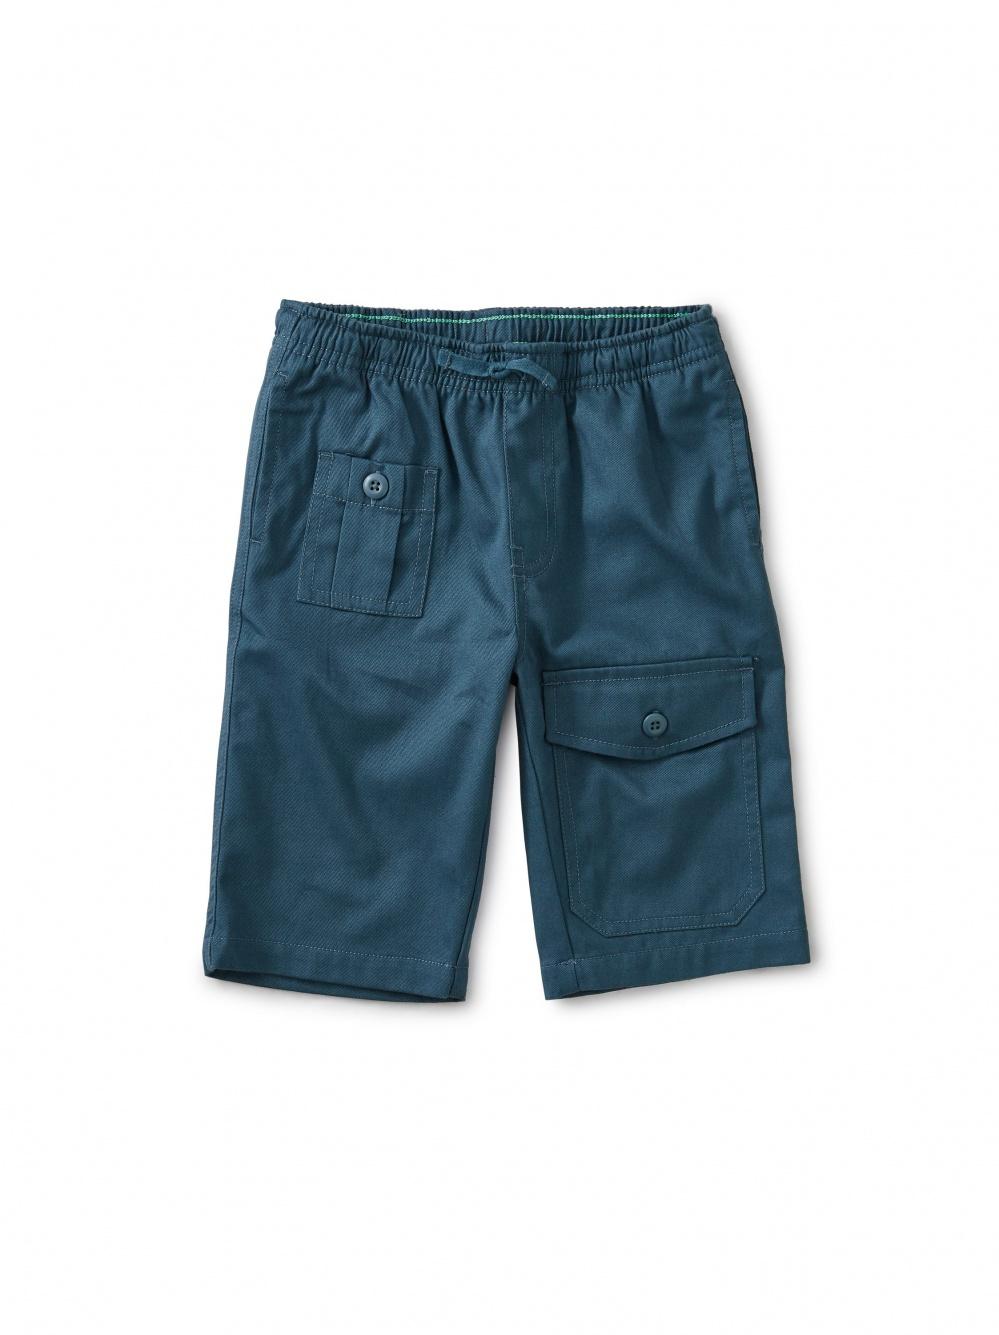 Rough N' Tough Shorts